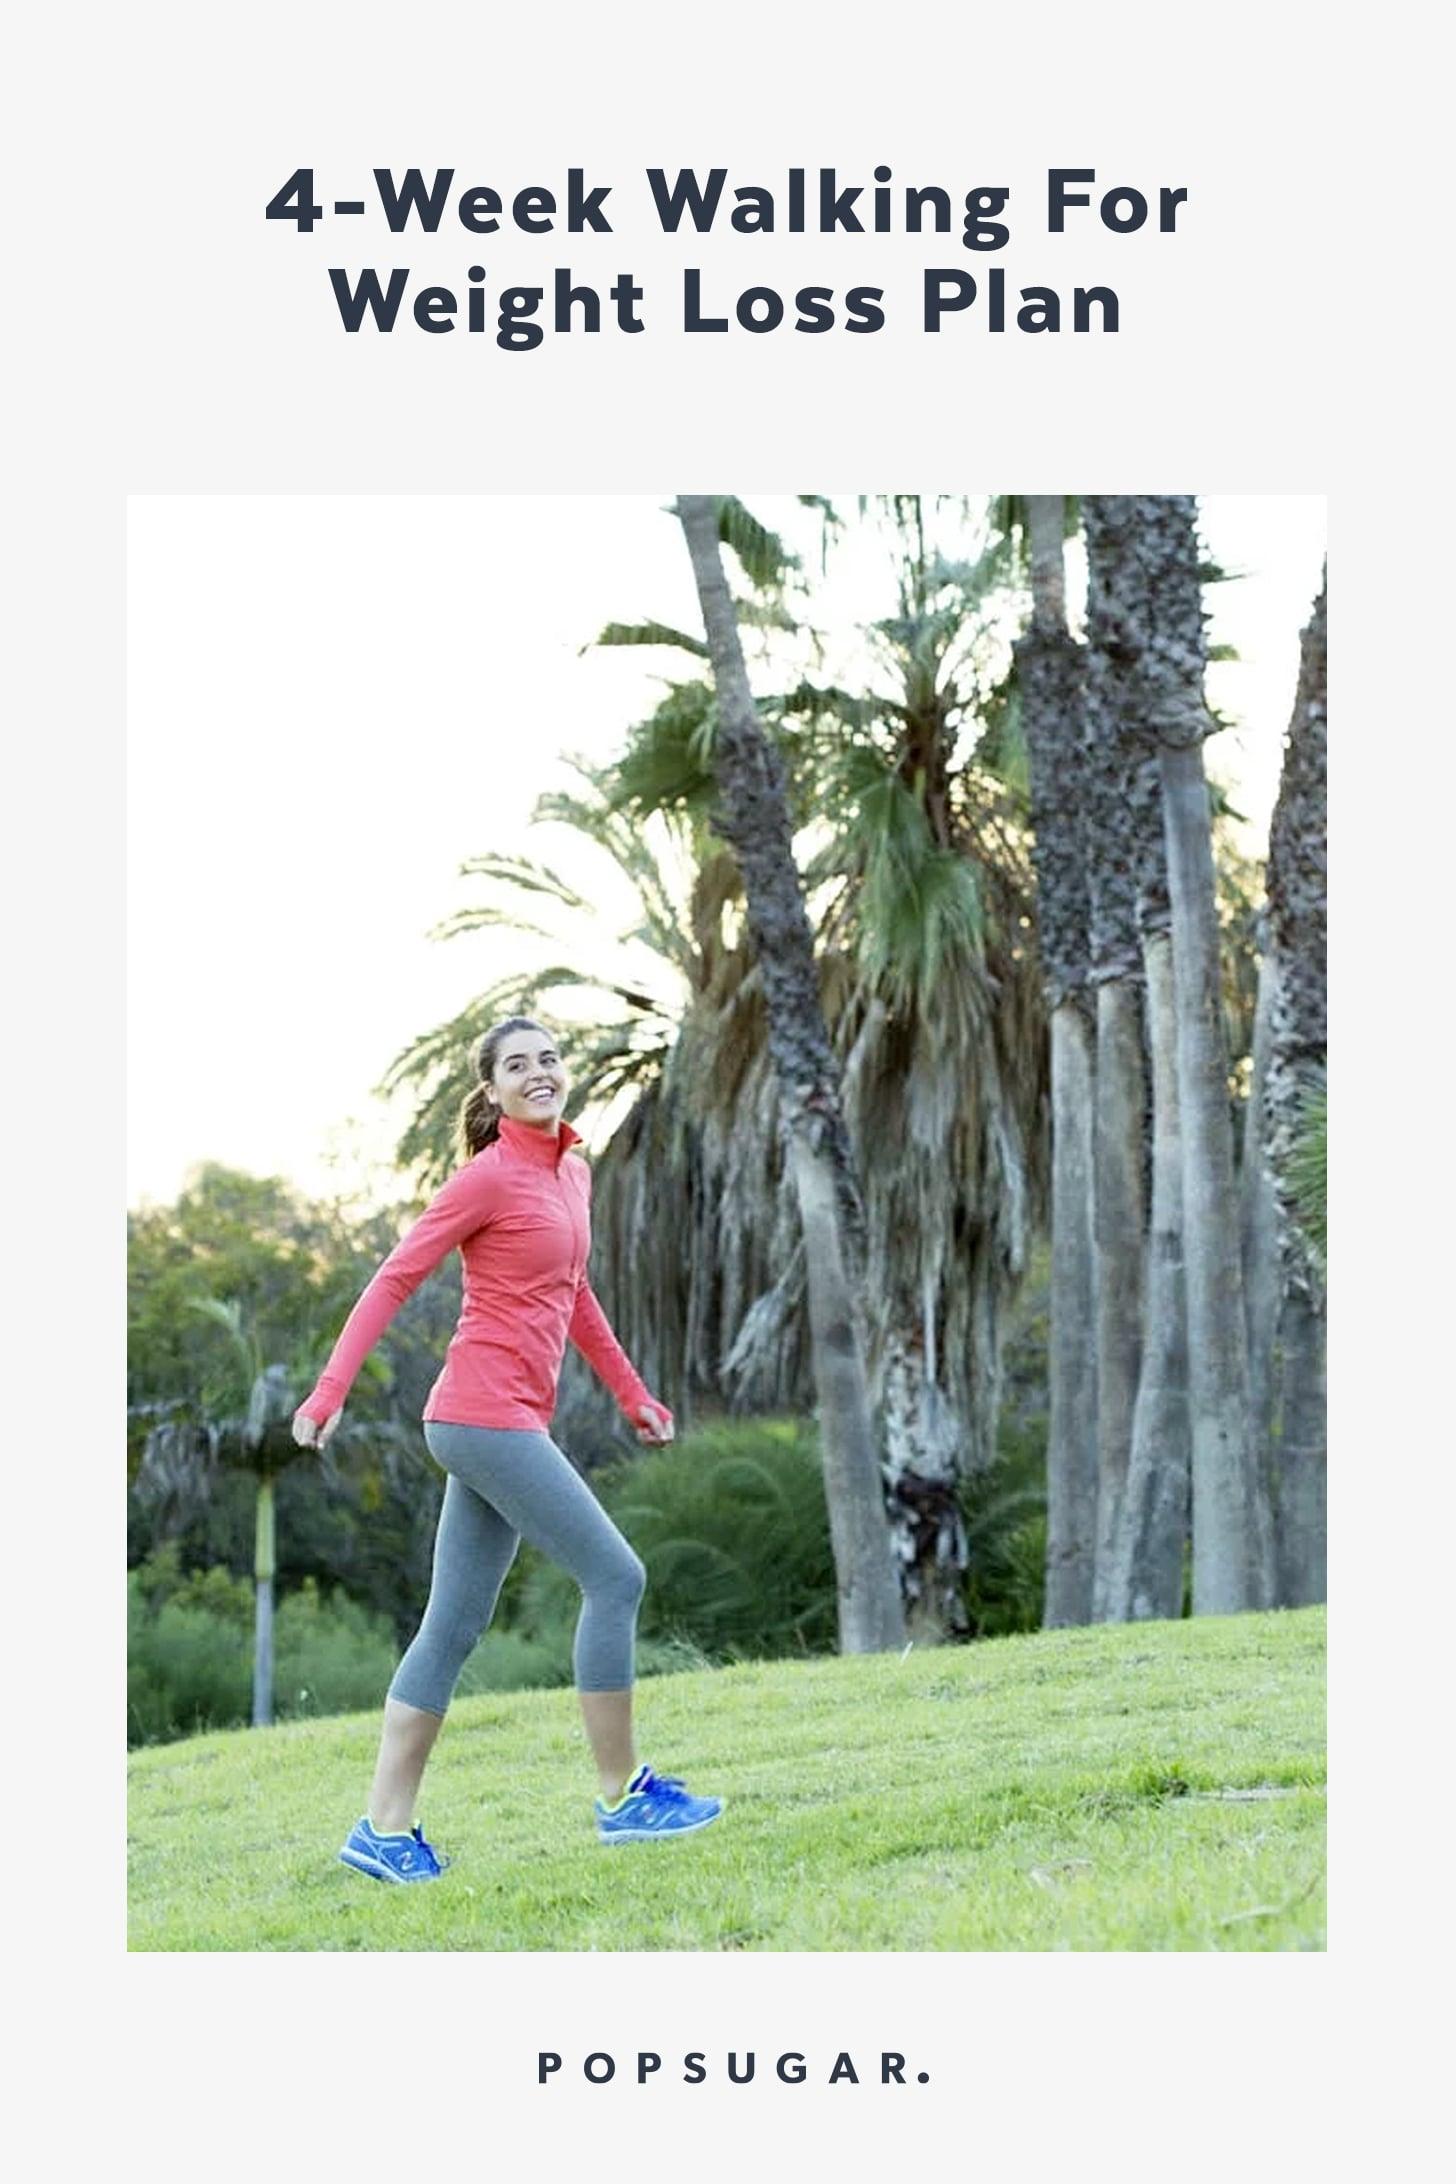 Walking For Weight Loss Plan | POPSUGAR Fitness